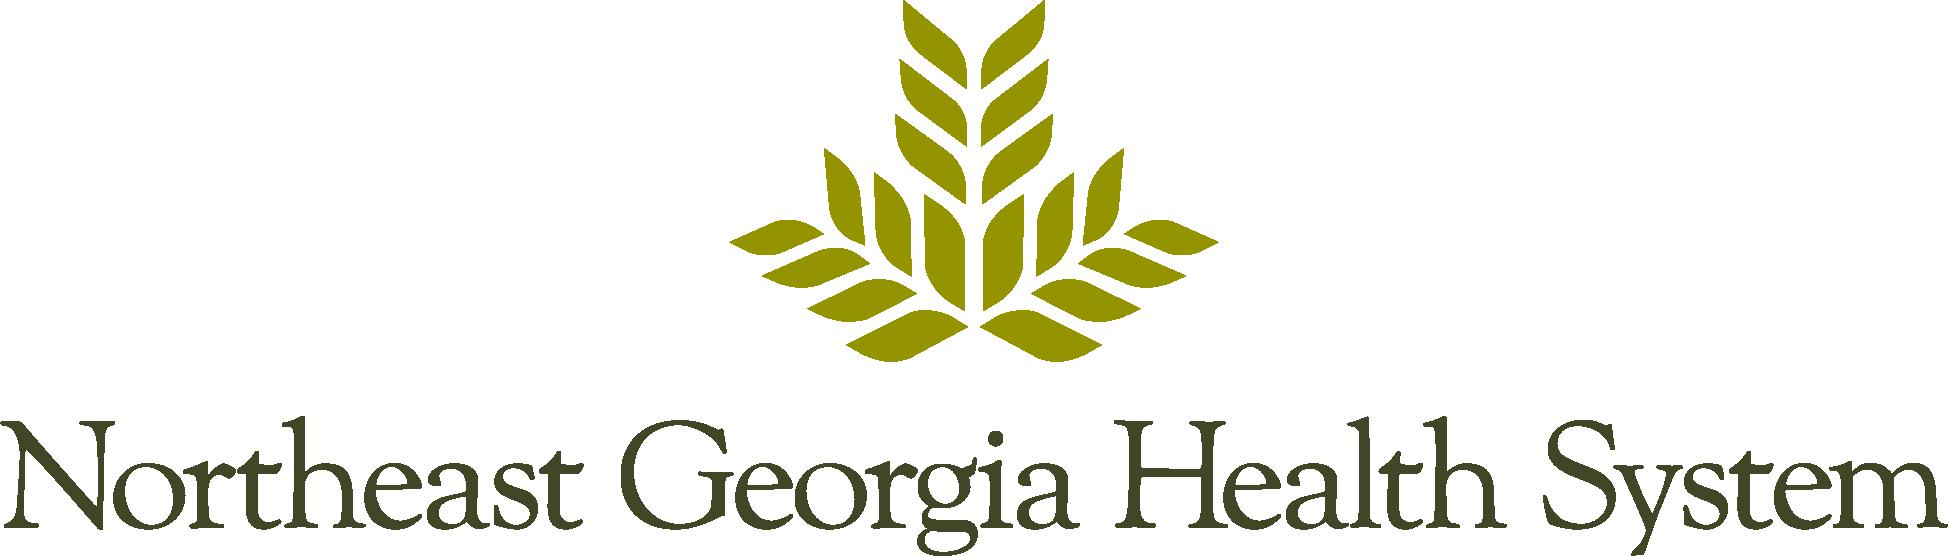 Northeast Georgia Health System (NGHS) Logo